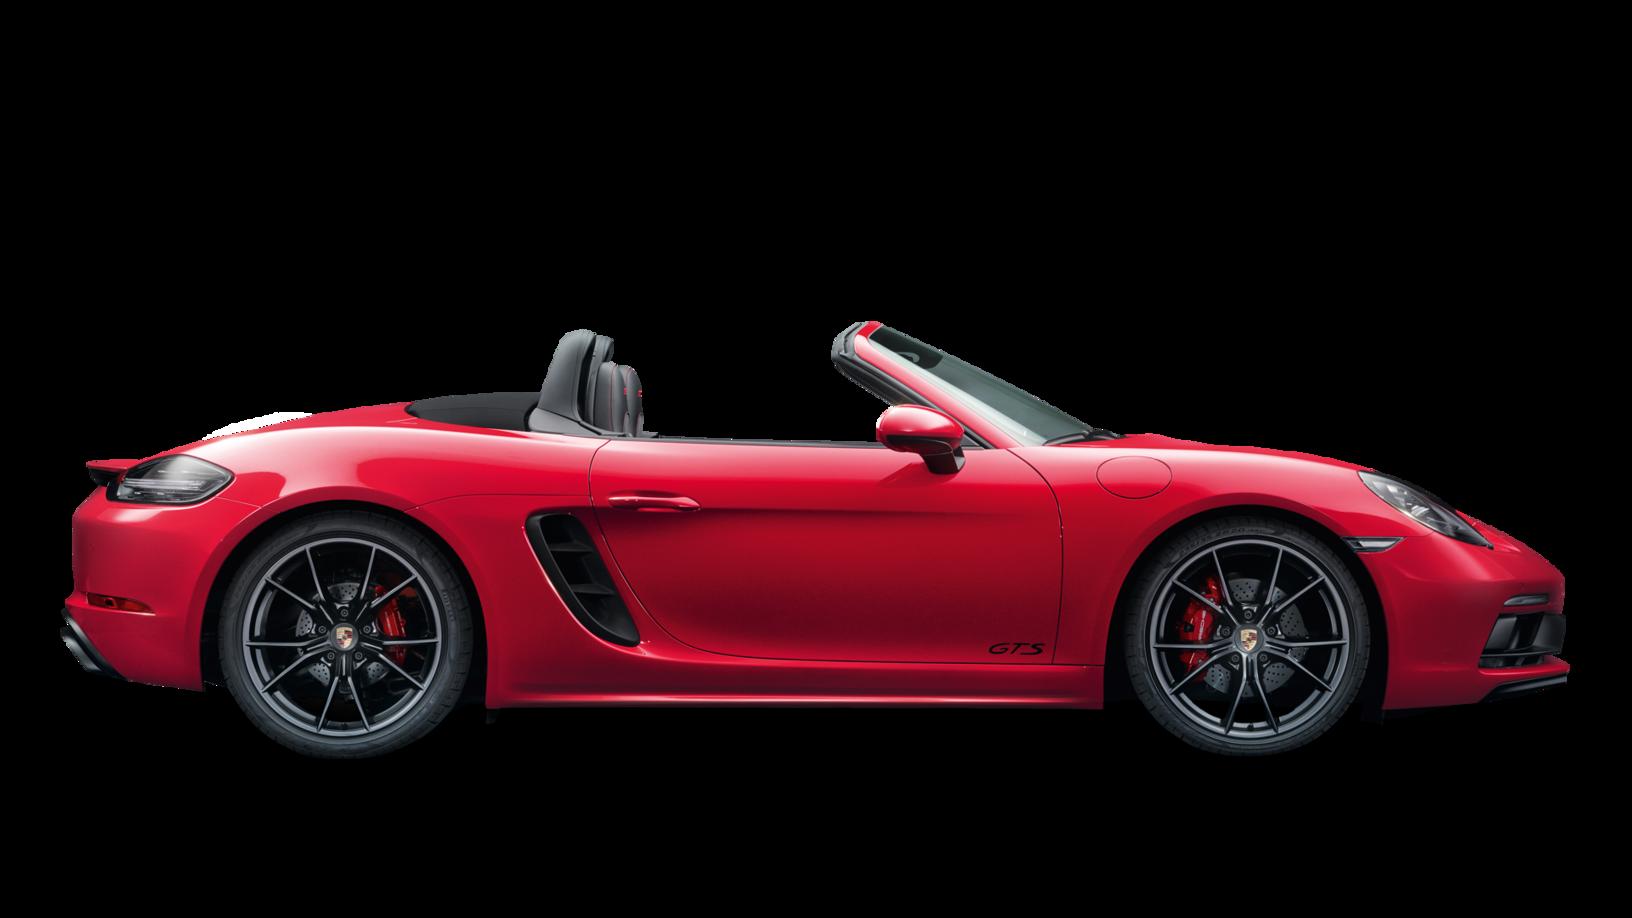 Porsche 718 Boxster GTS - Technical Specs